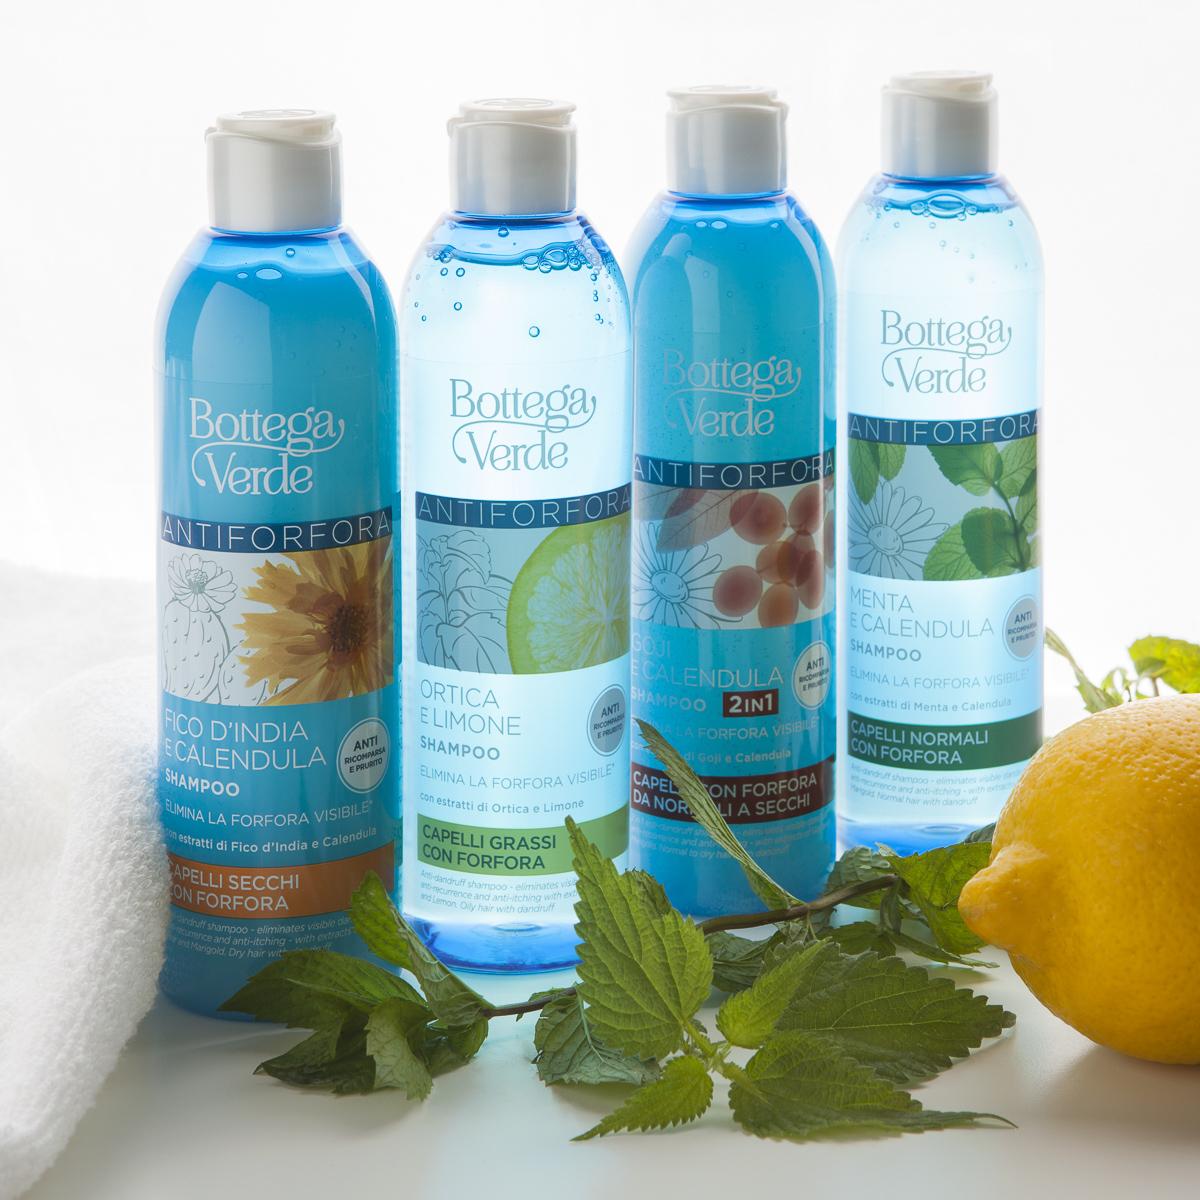 shampoo antiforfora ortica limone menta